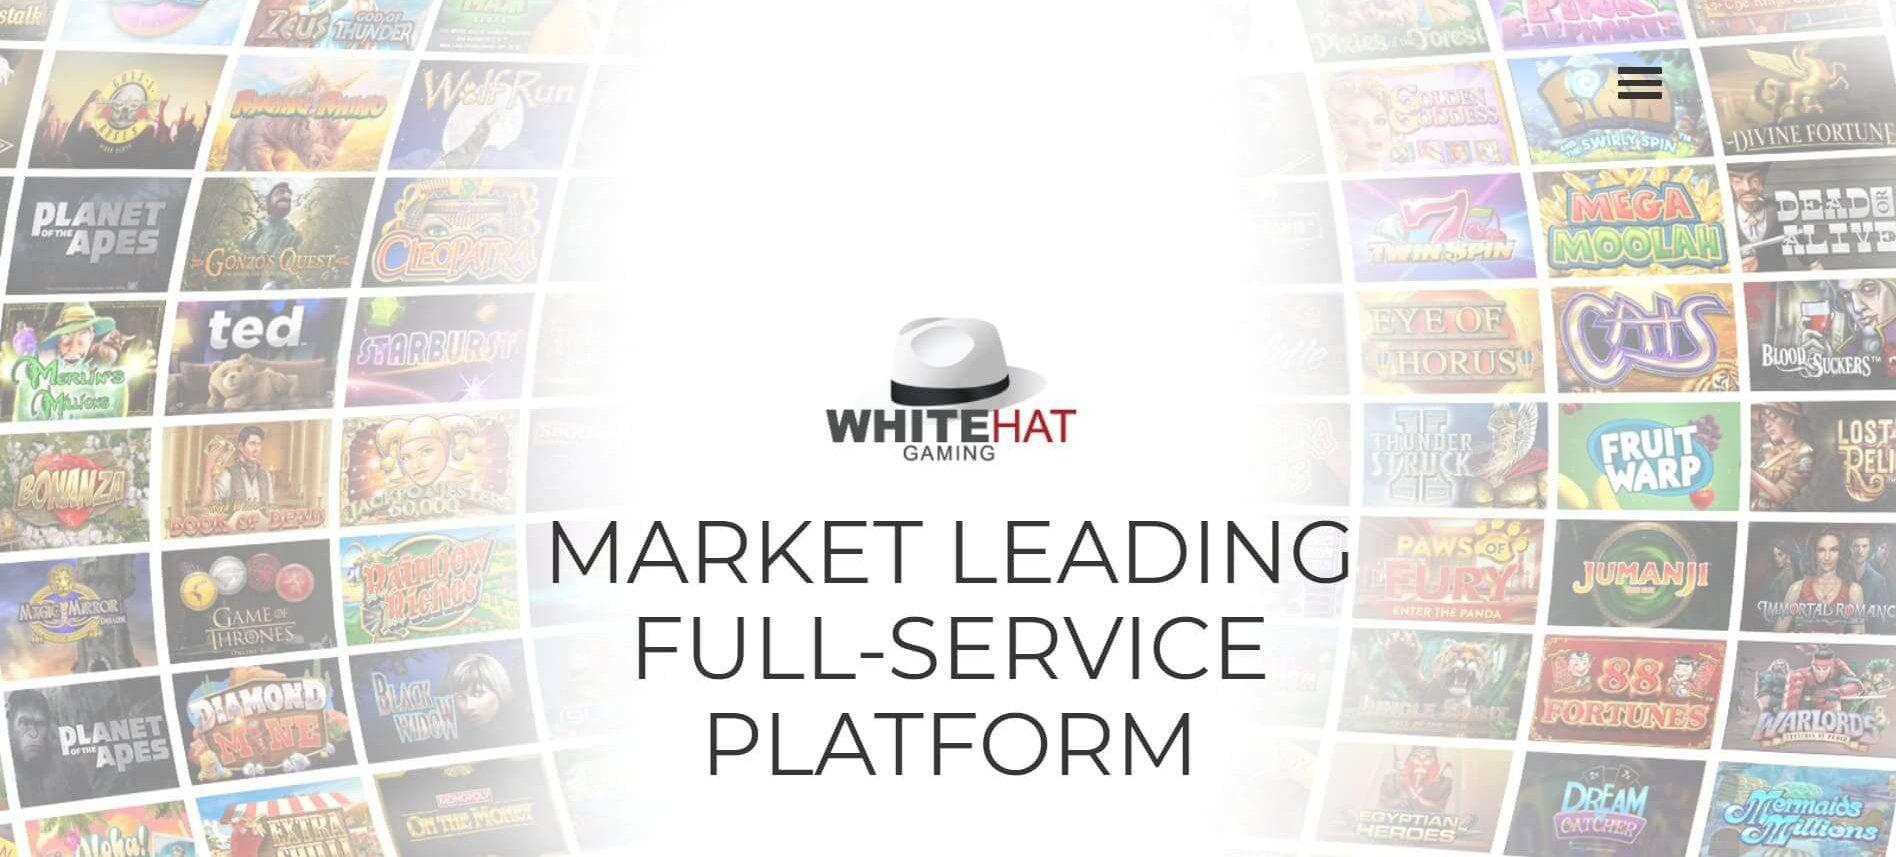 PlayGrand ägs av White Hat Gaming